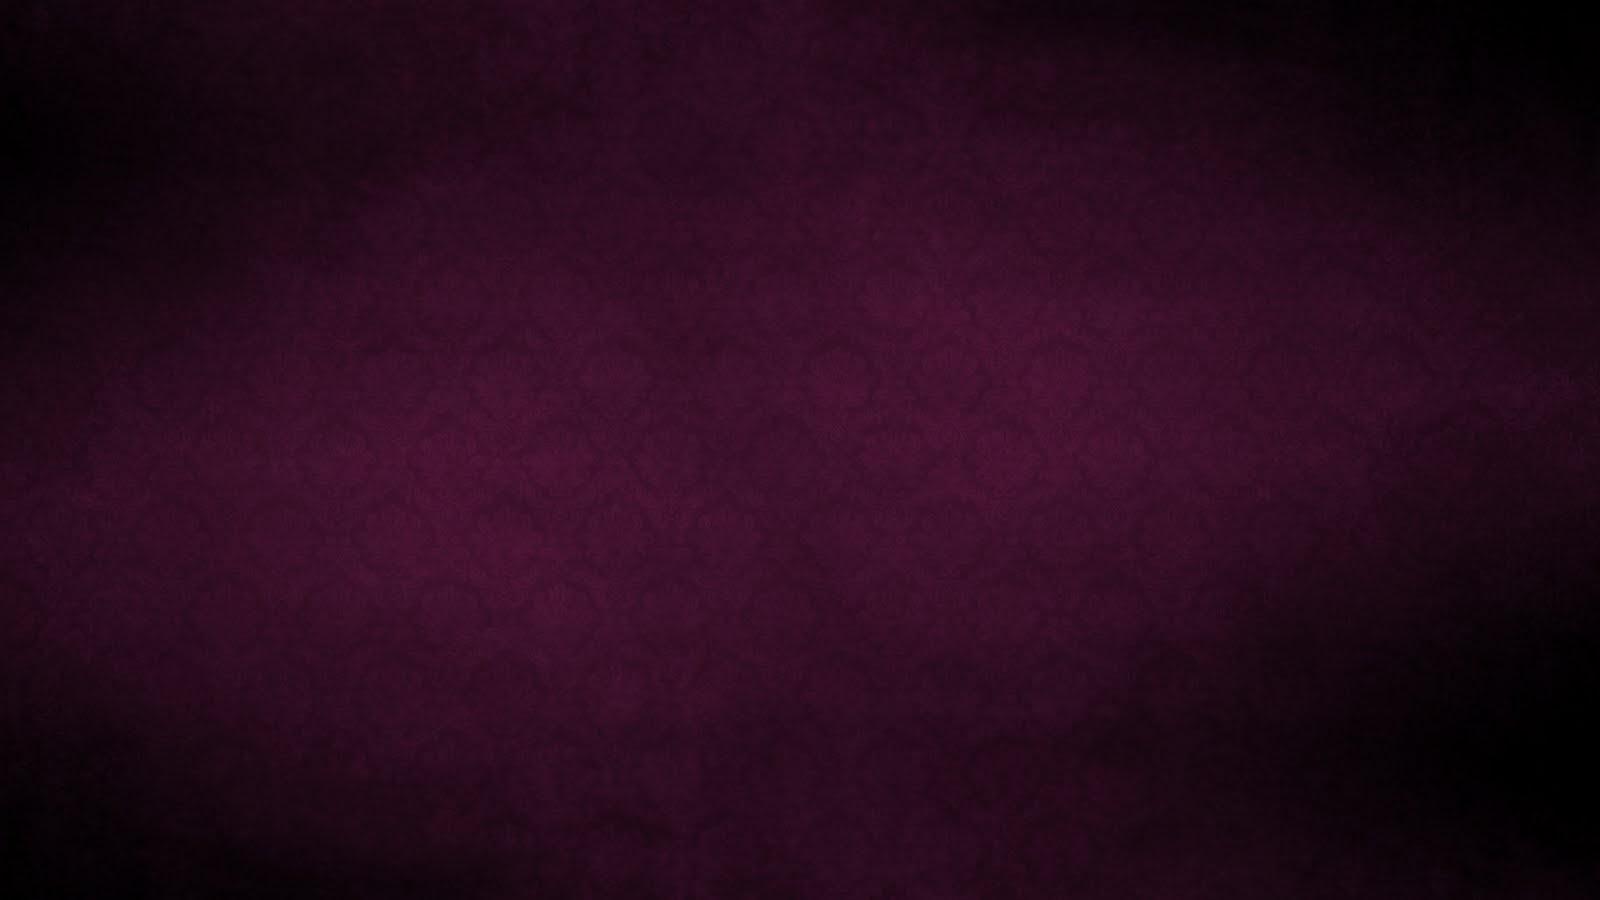 Plain Wallpapers   Download Free High Definition Desktop Backgrounds